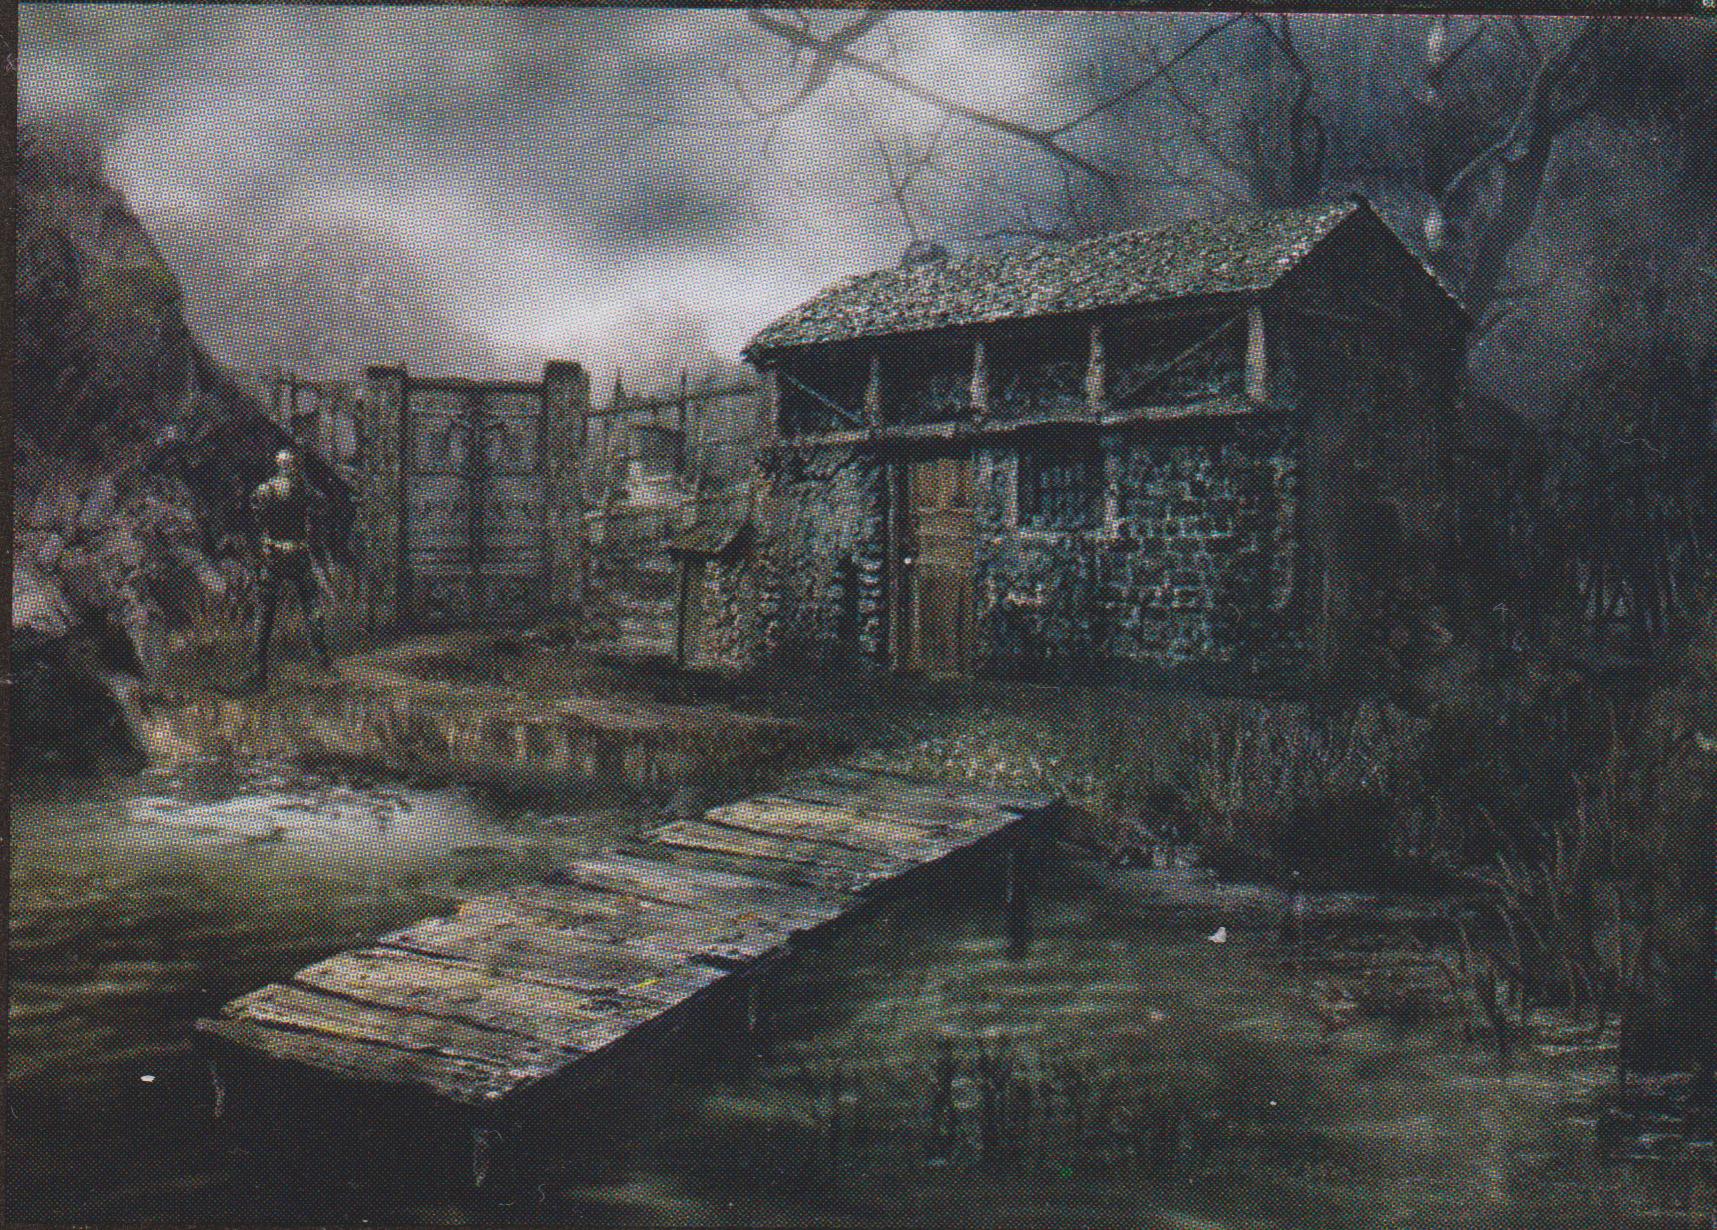 evil landscape background - photo #24